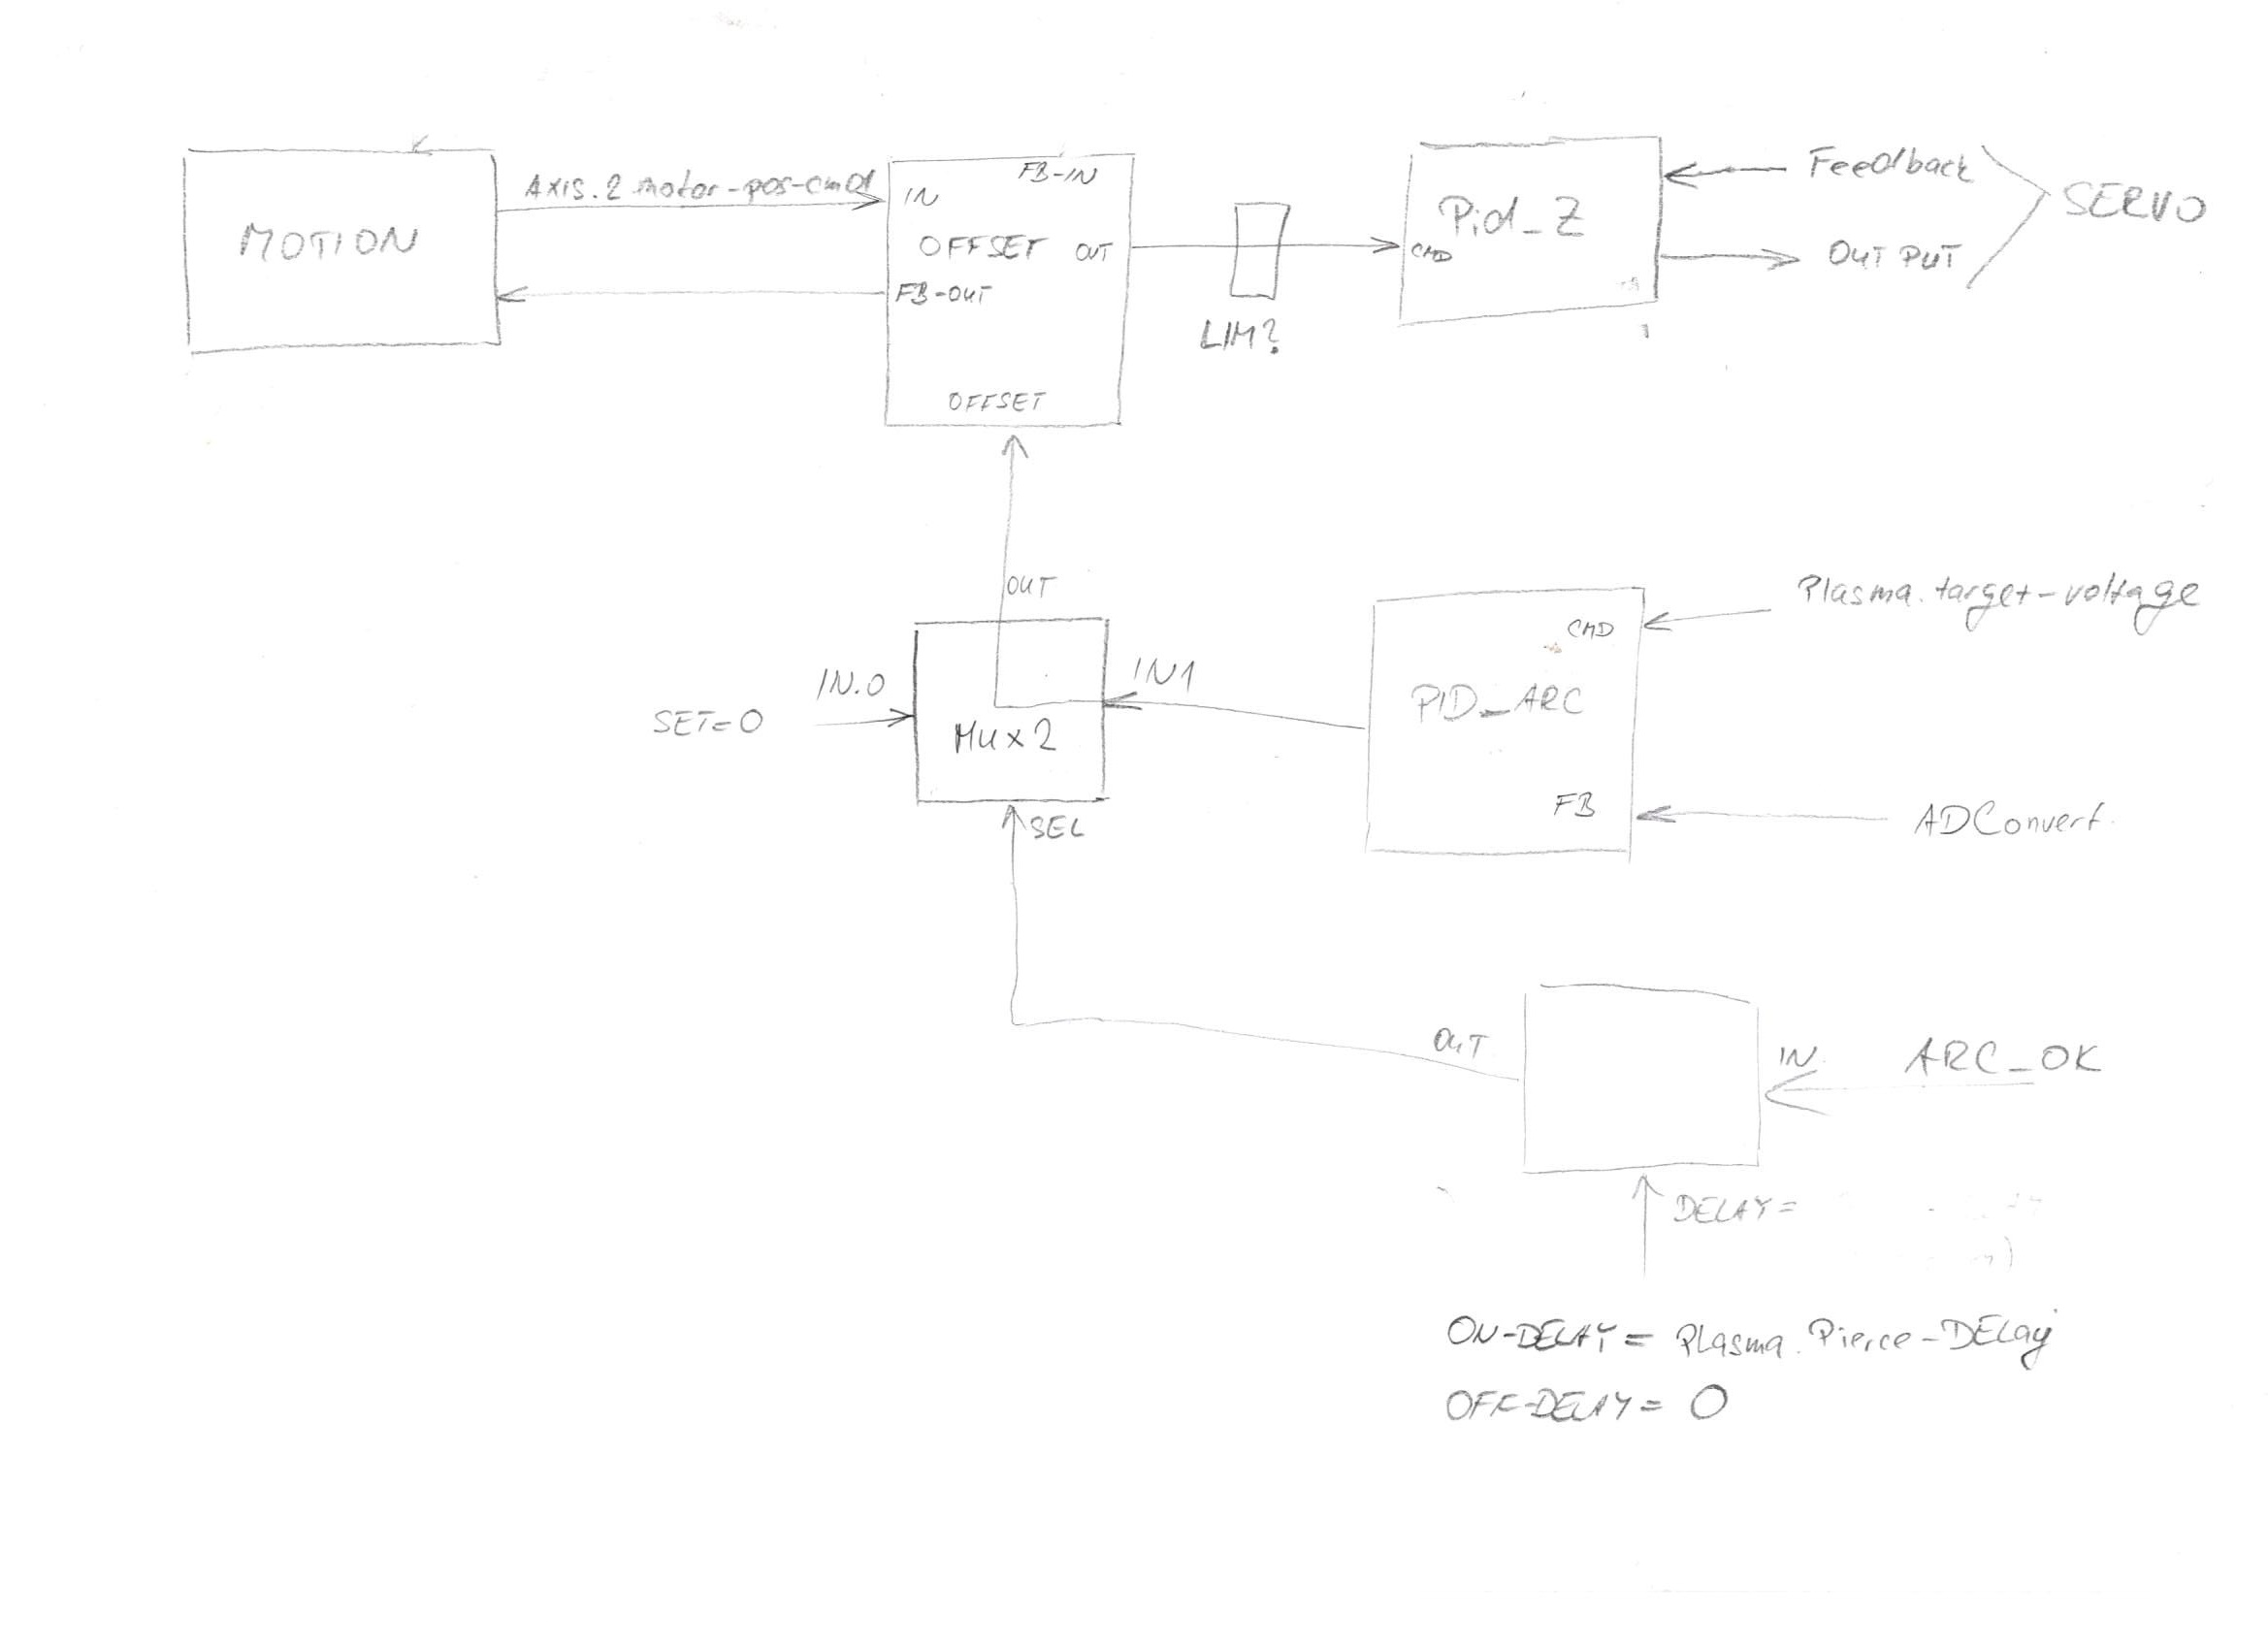 CNC plazma Microstep - retrofit - LinuxCNC